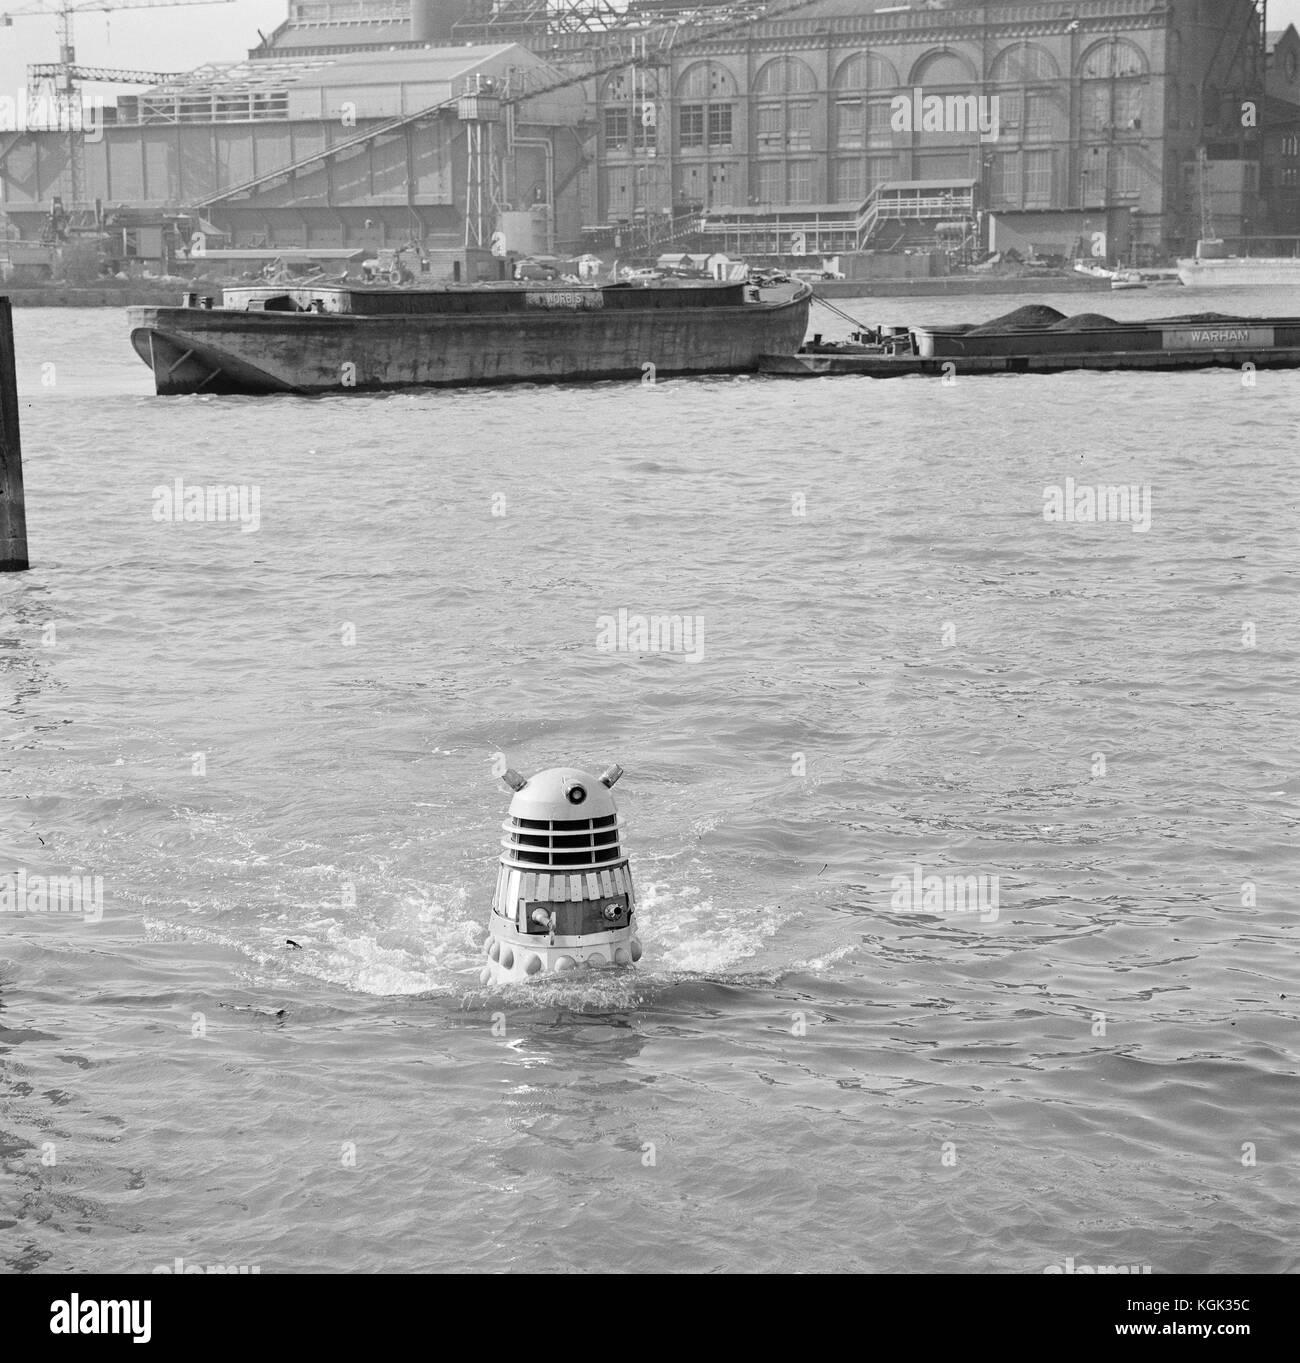 Daleks Invasion Earth 2150AD (1966)     Date: 1966 - Stock Image